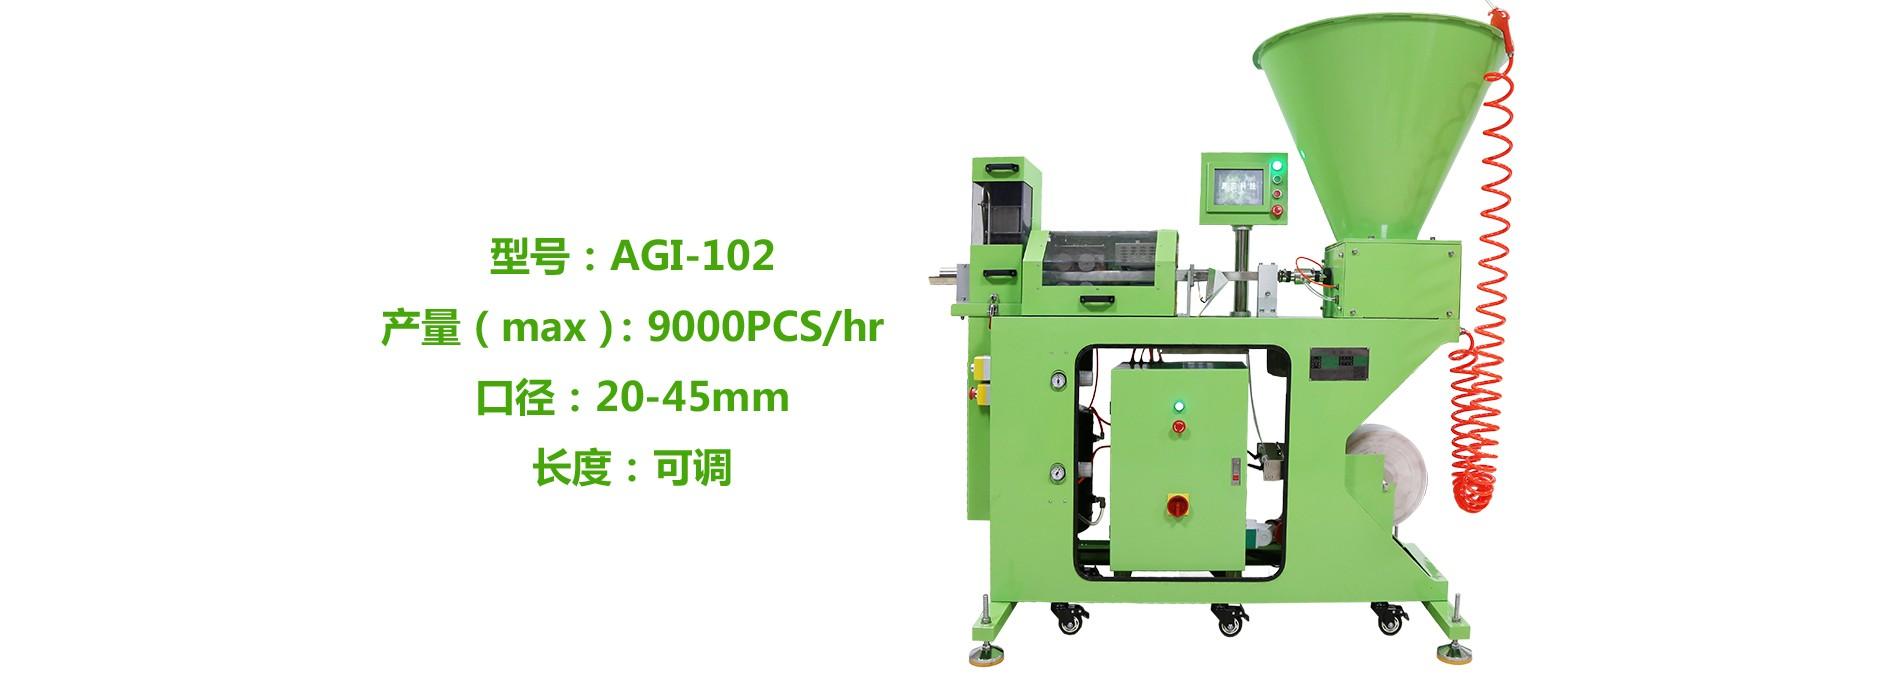 AGI-102